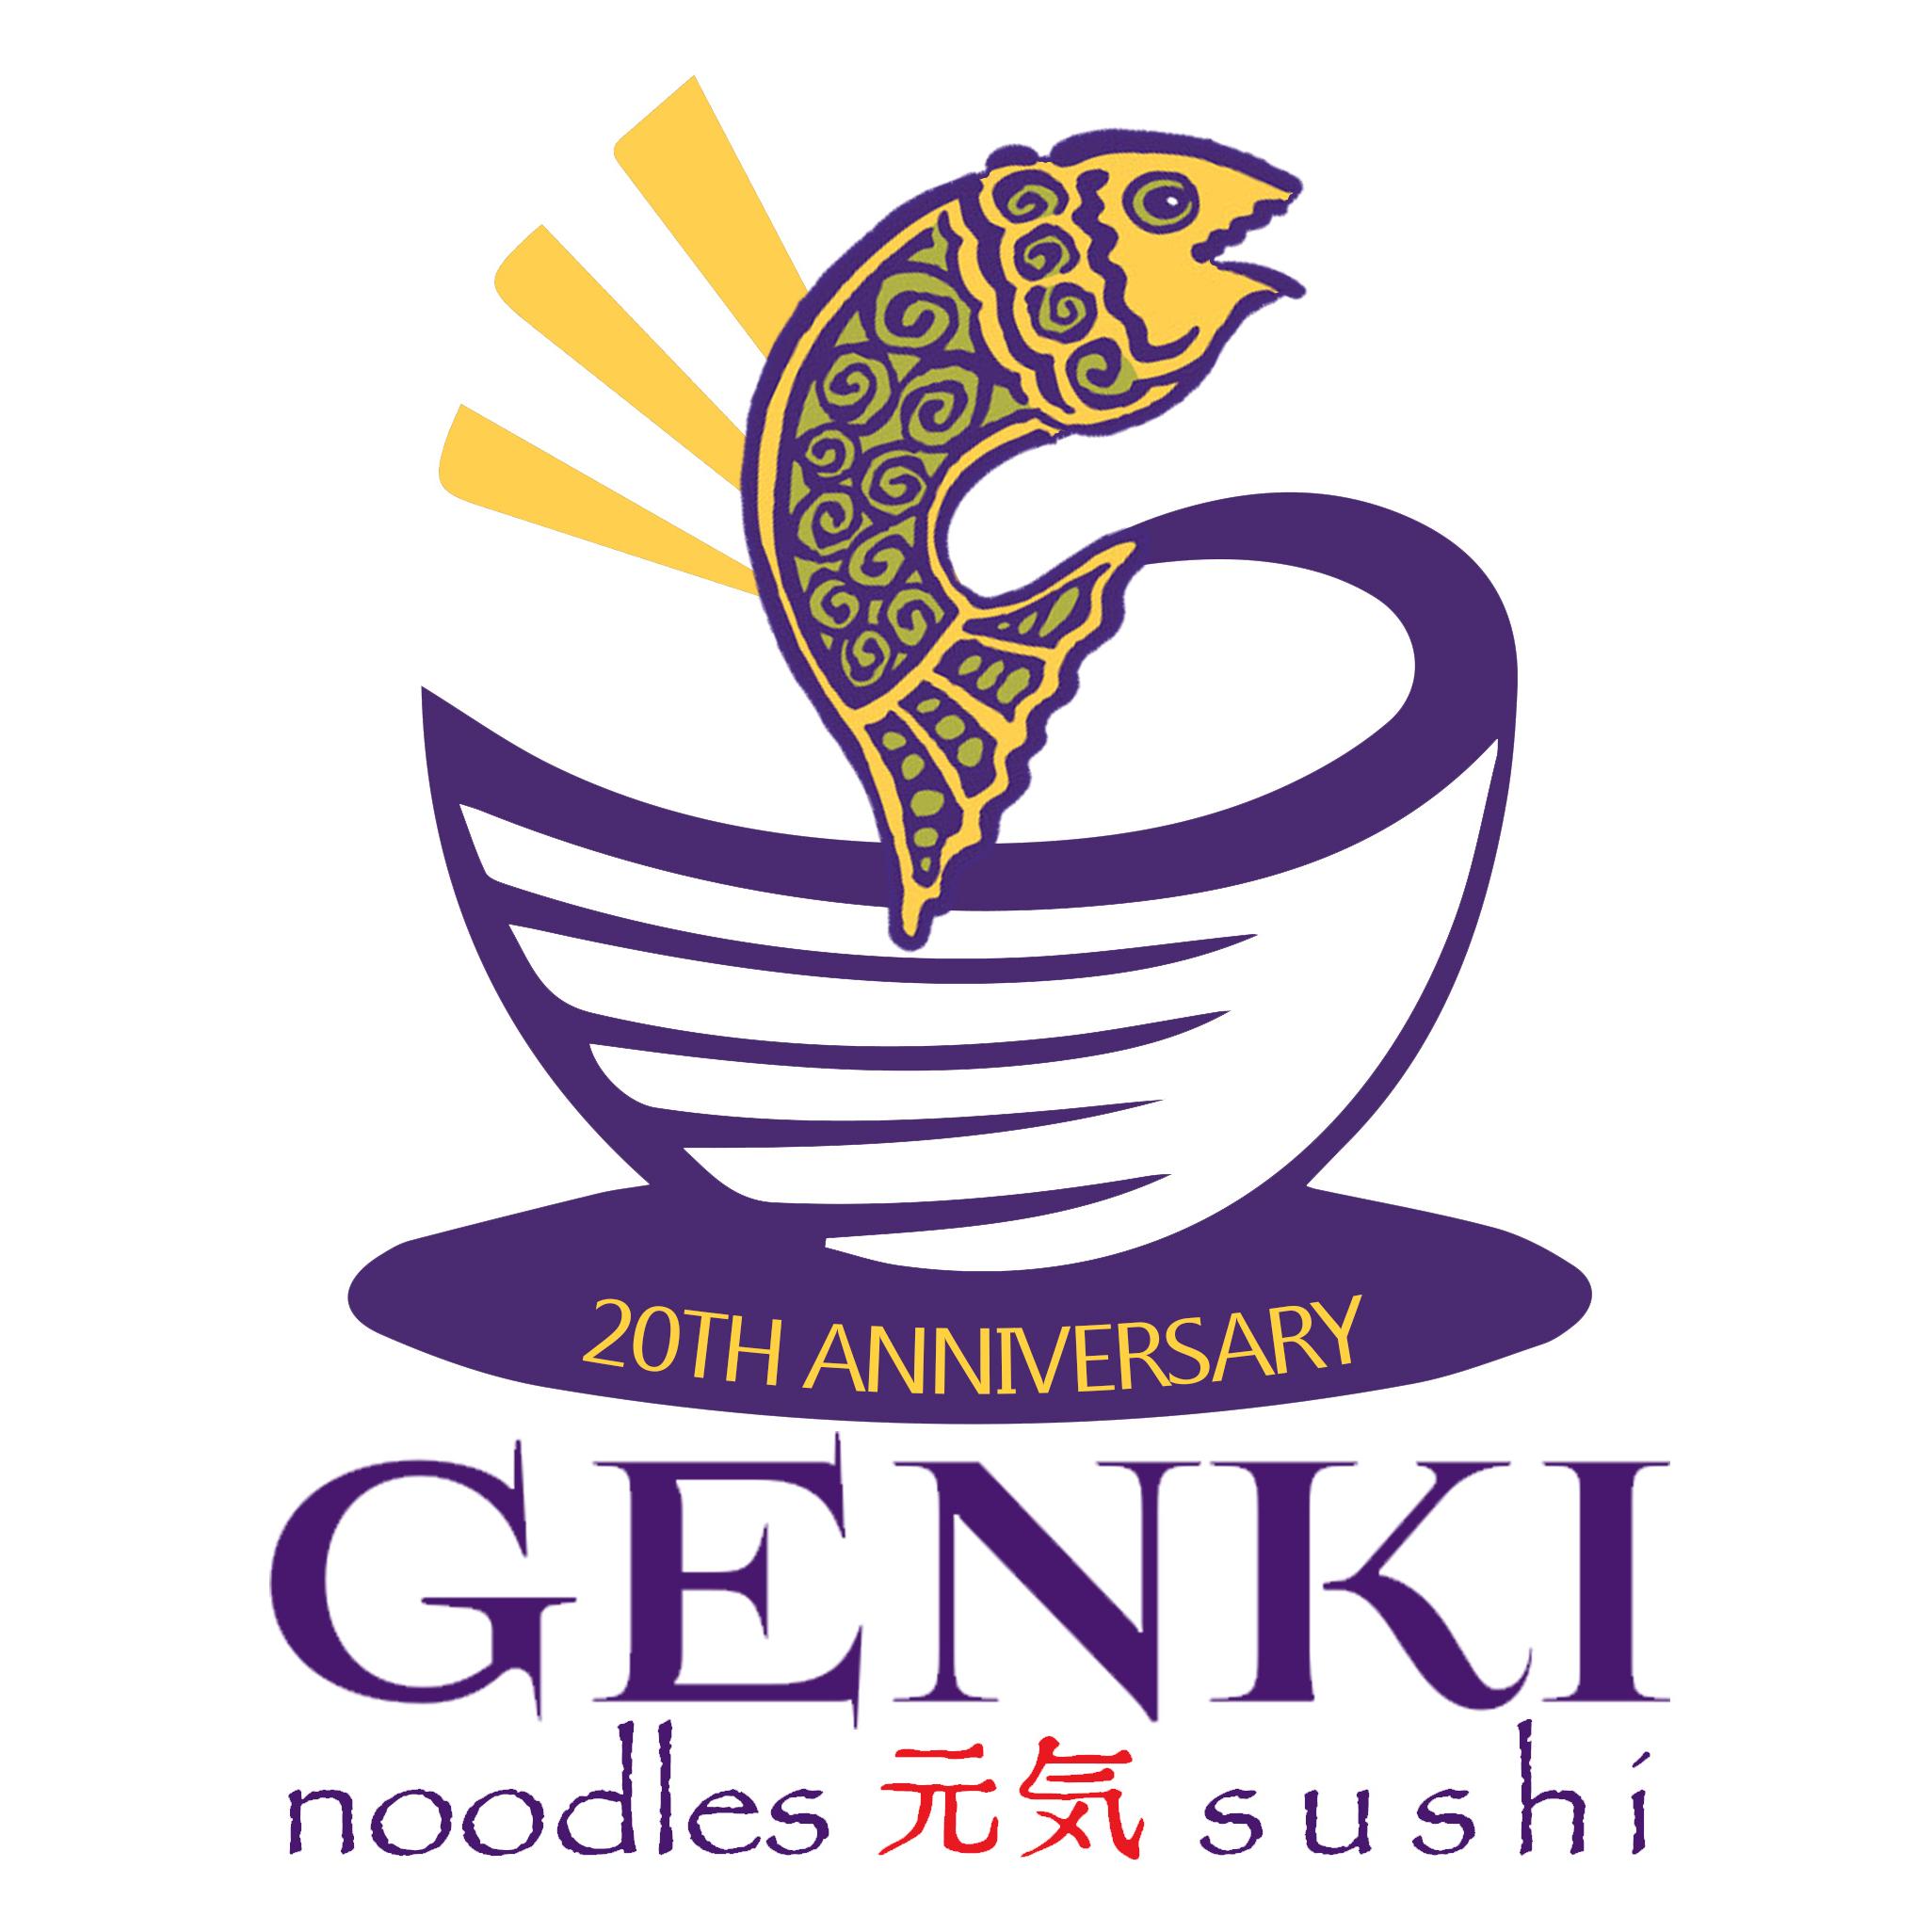 GENKI Noodles and Sushi - Prado